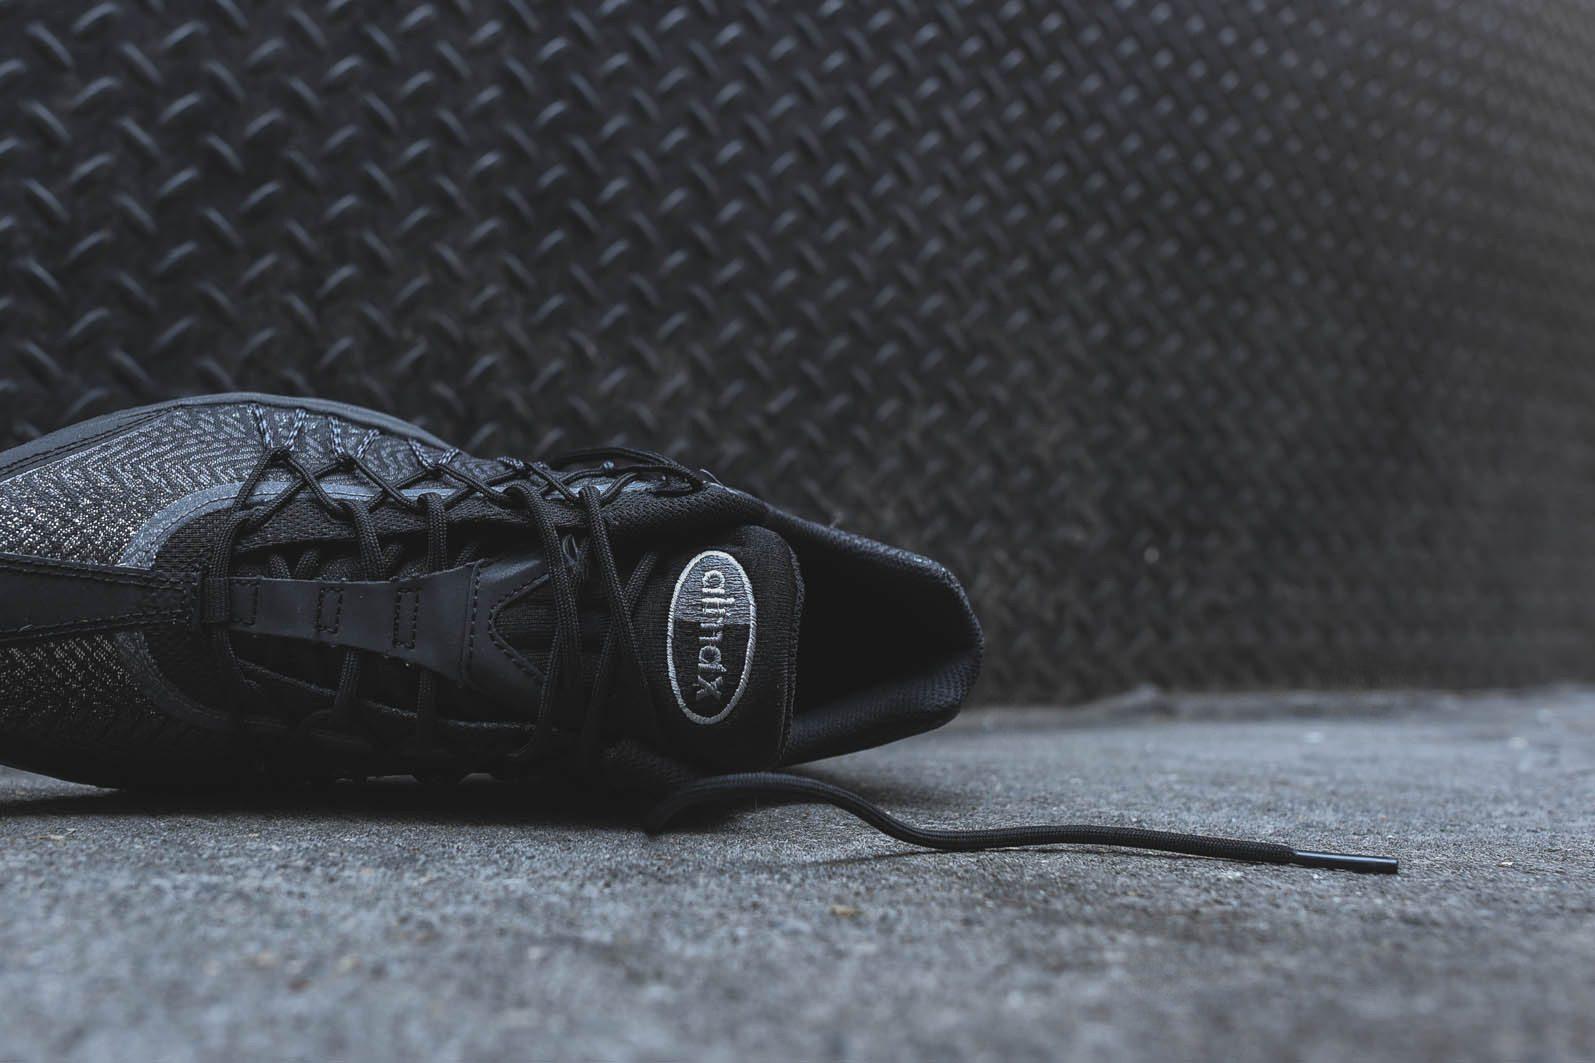 Nike Air Max 95 Ultra JCRD Black Dark Grey 8